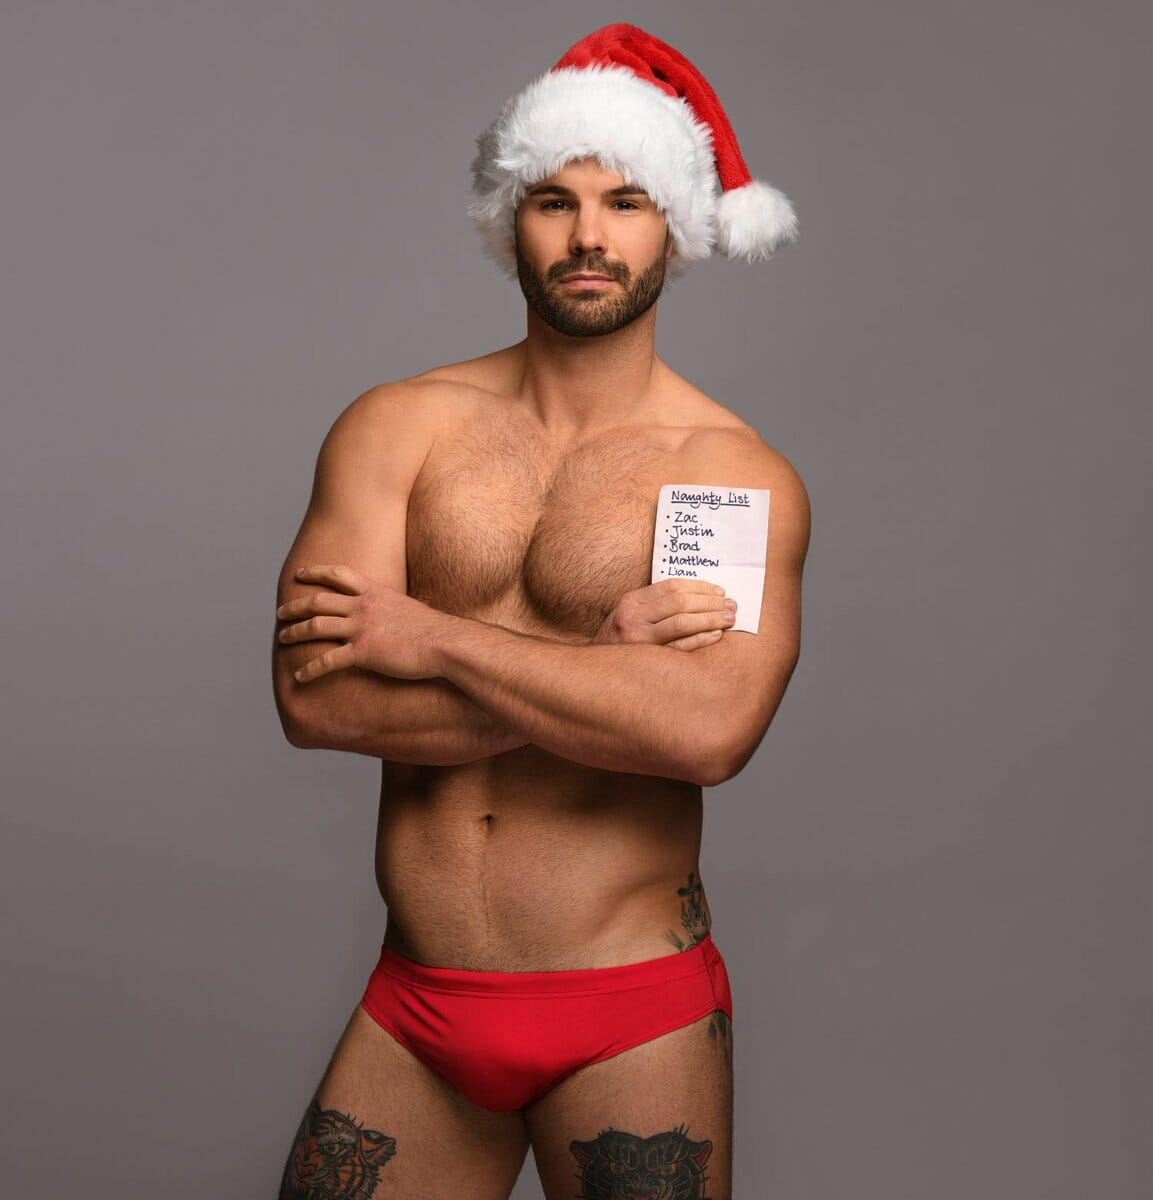 Simon Dunn sexy Christmas guy